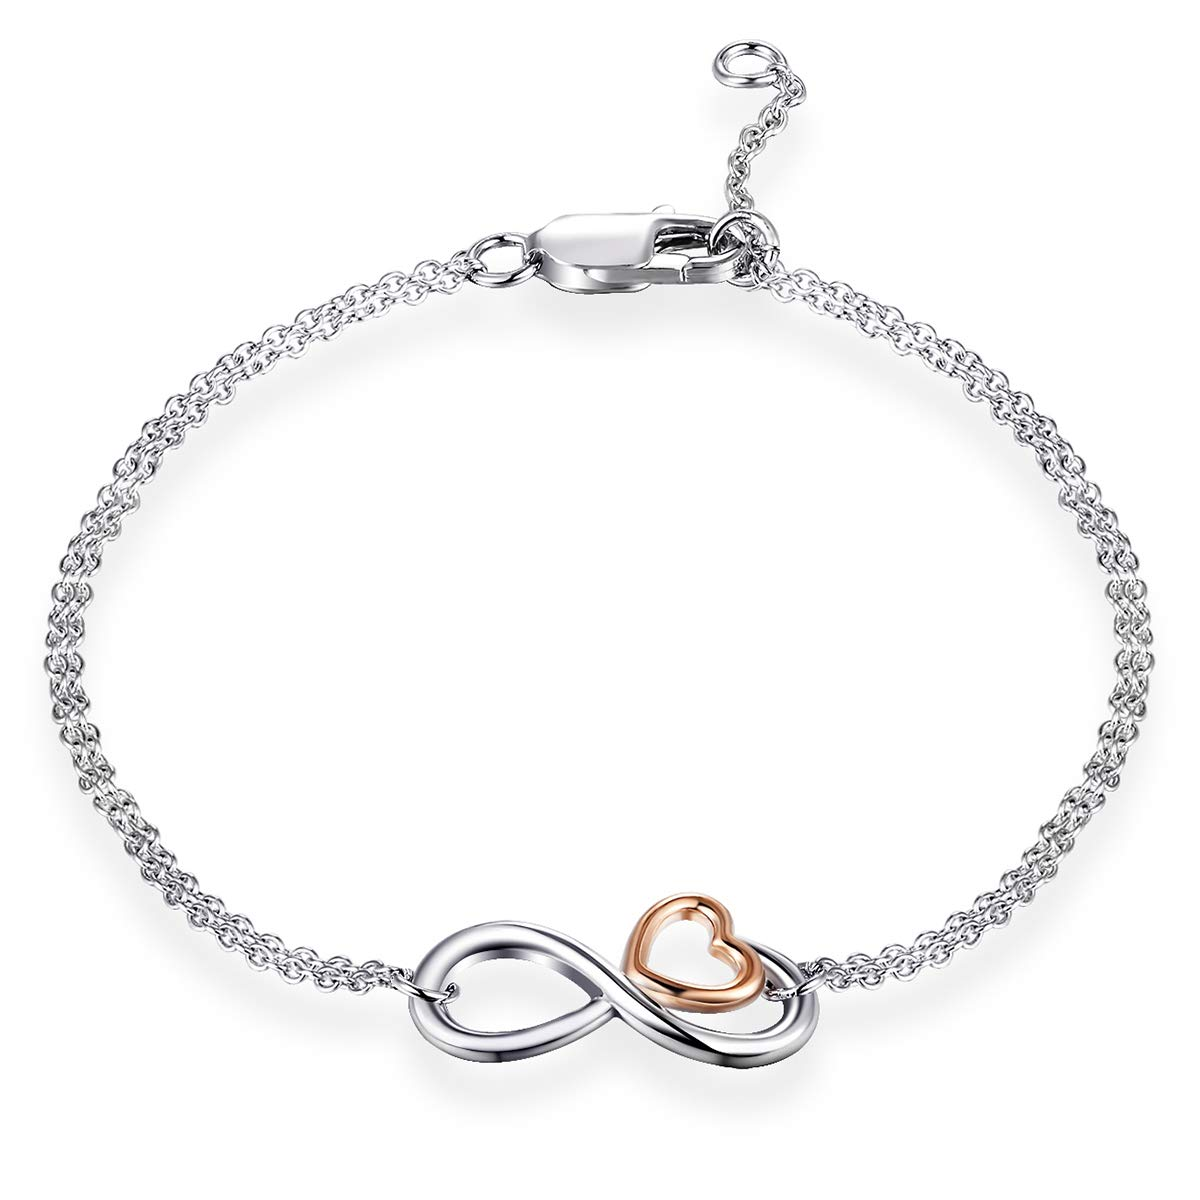 MUATOGIML 925 Sterling Silver Infinity Endless Love Heart Symbol Charm Adjustable Bracelet for Women Girls